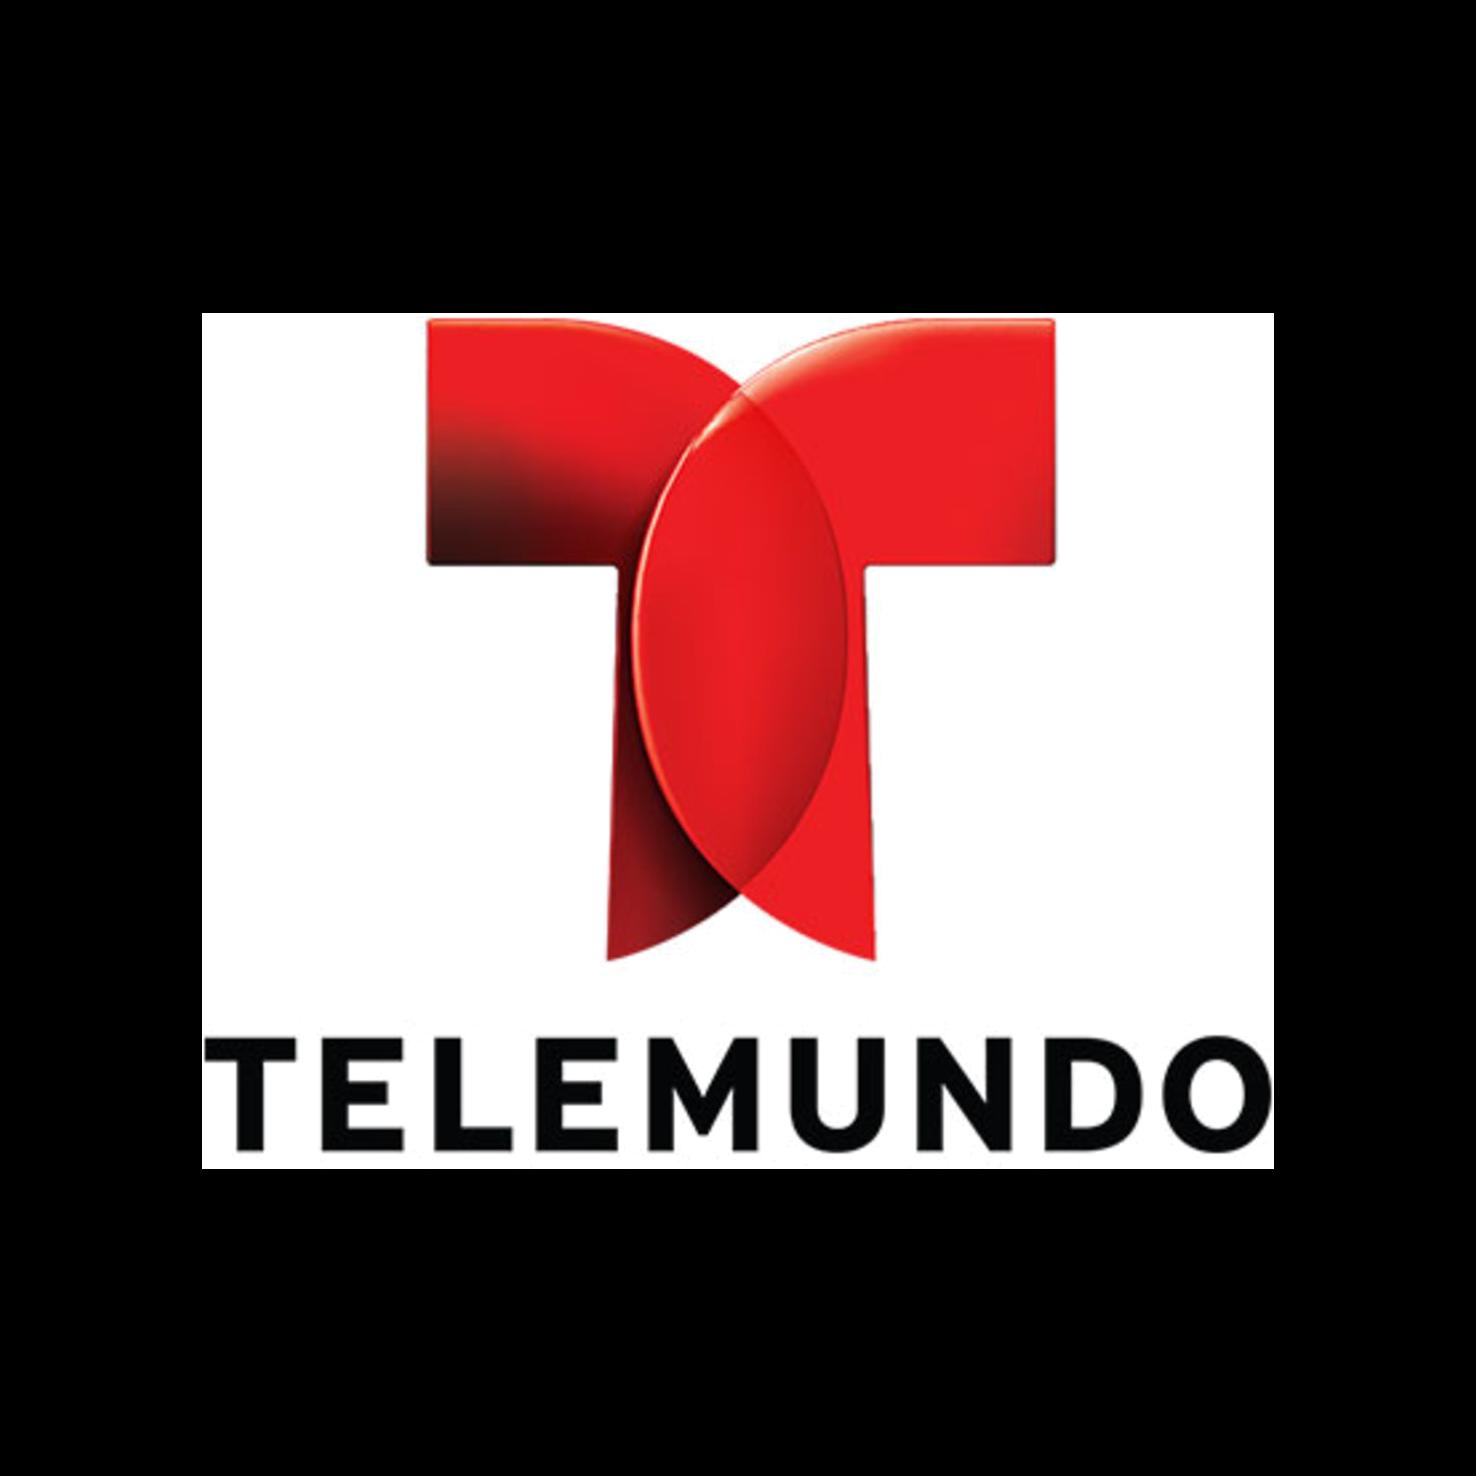 telemundo-logojpg.png